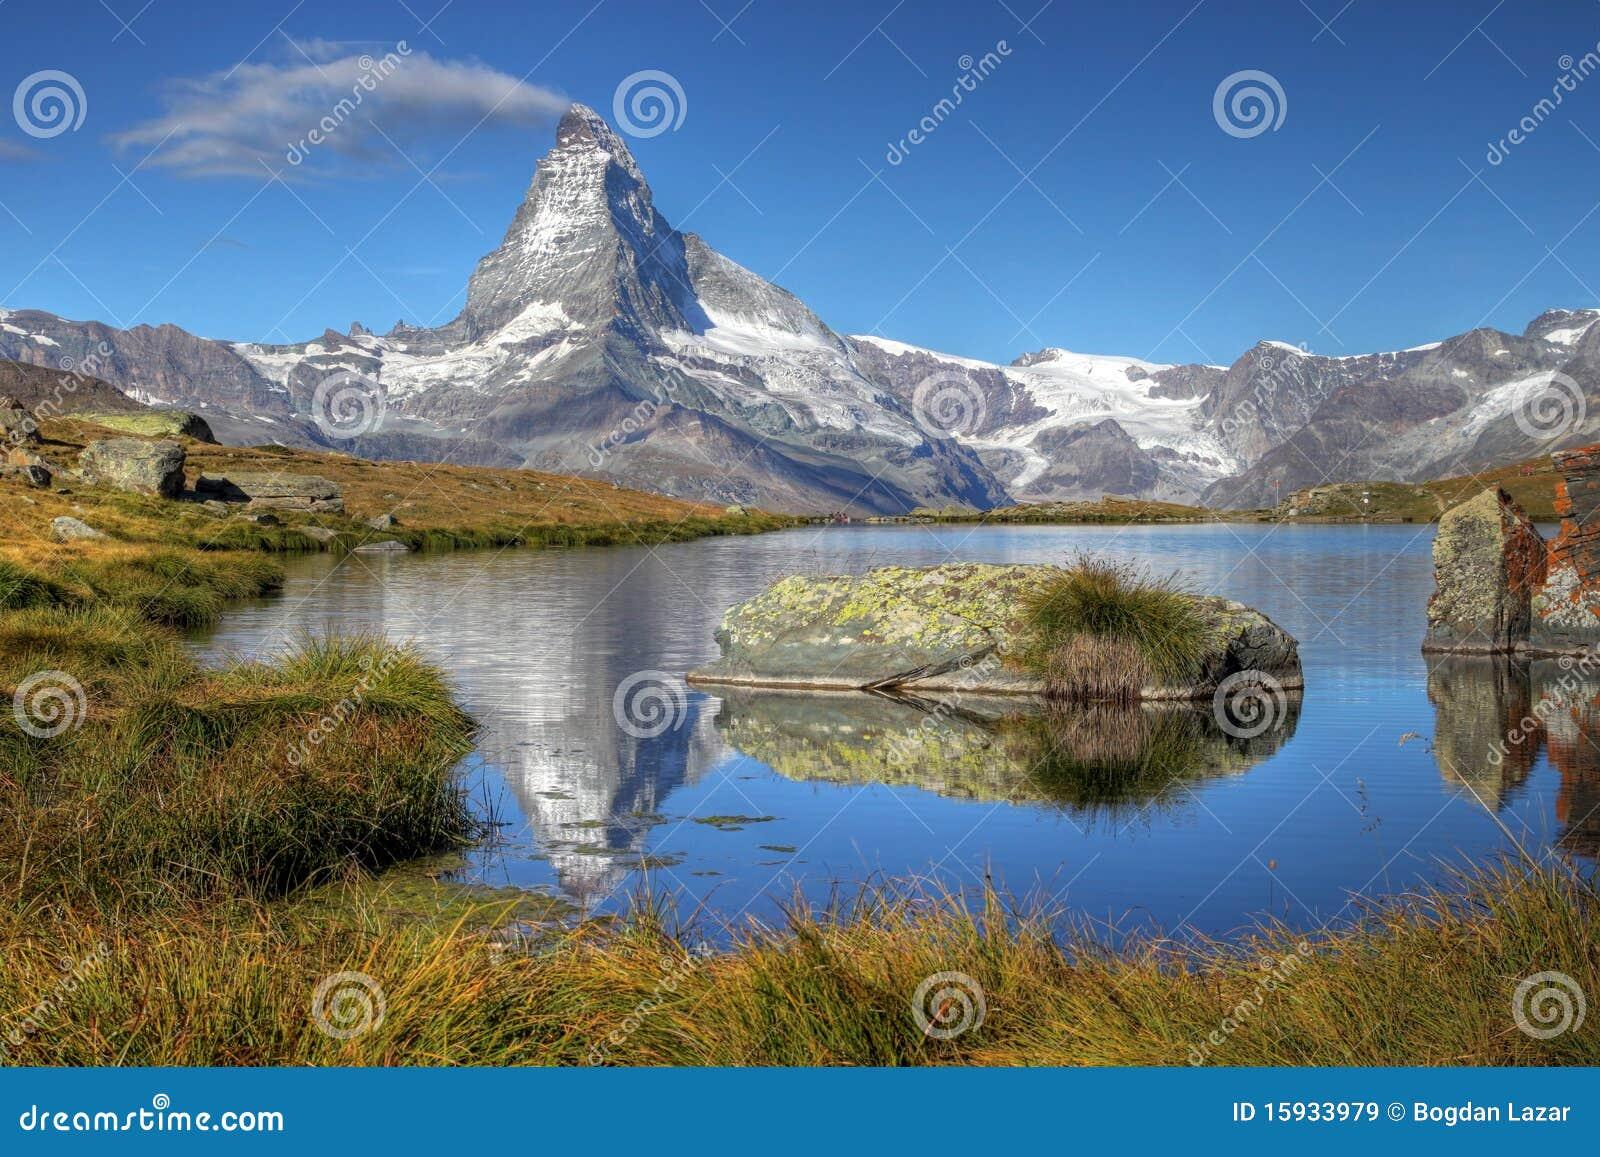 Download Matterhorn Switzerland stock image. Image of matterhorn - 15933979